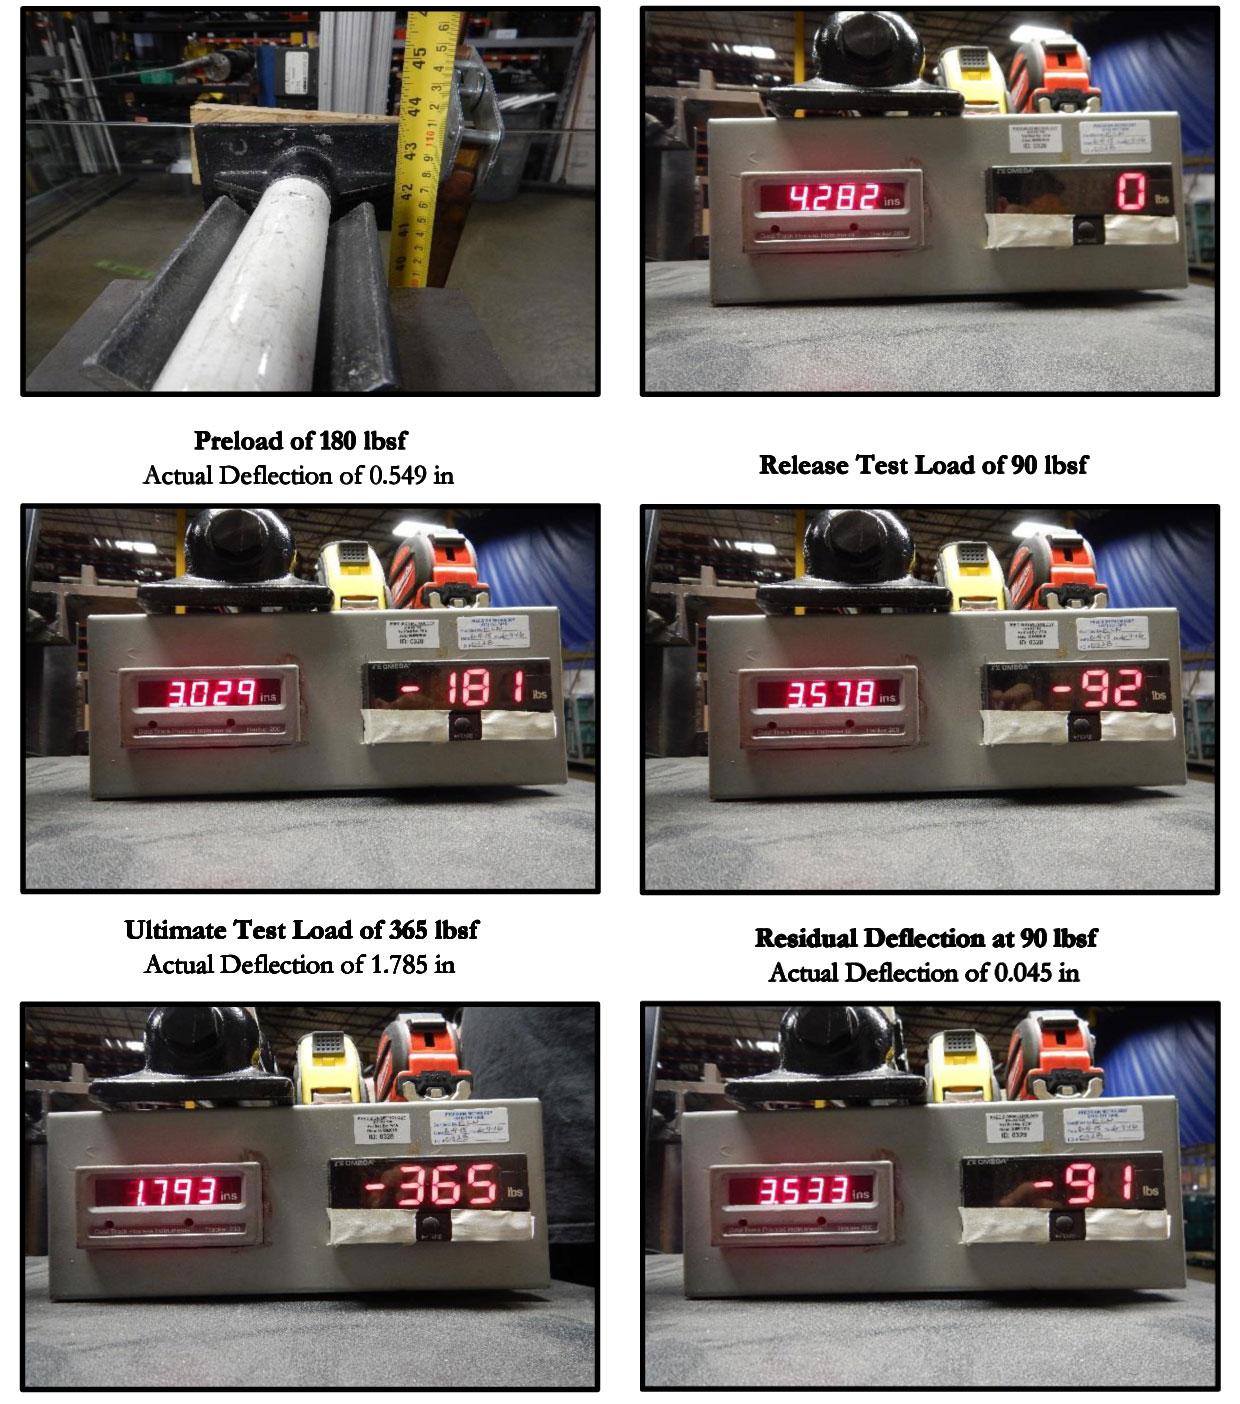 tr002-12-0.5-sgp-astme985-deflectiontest.jpg